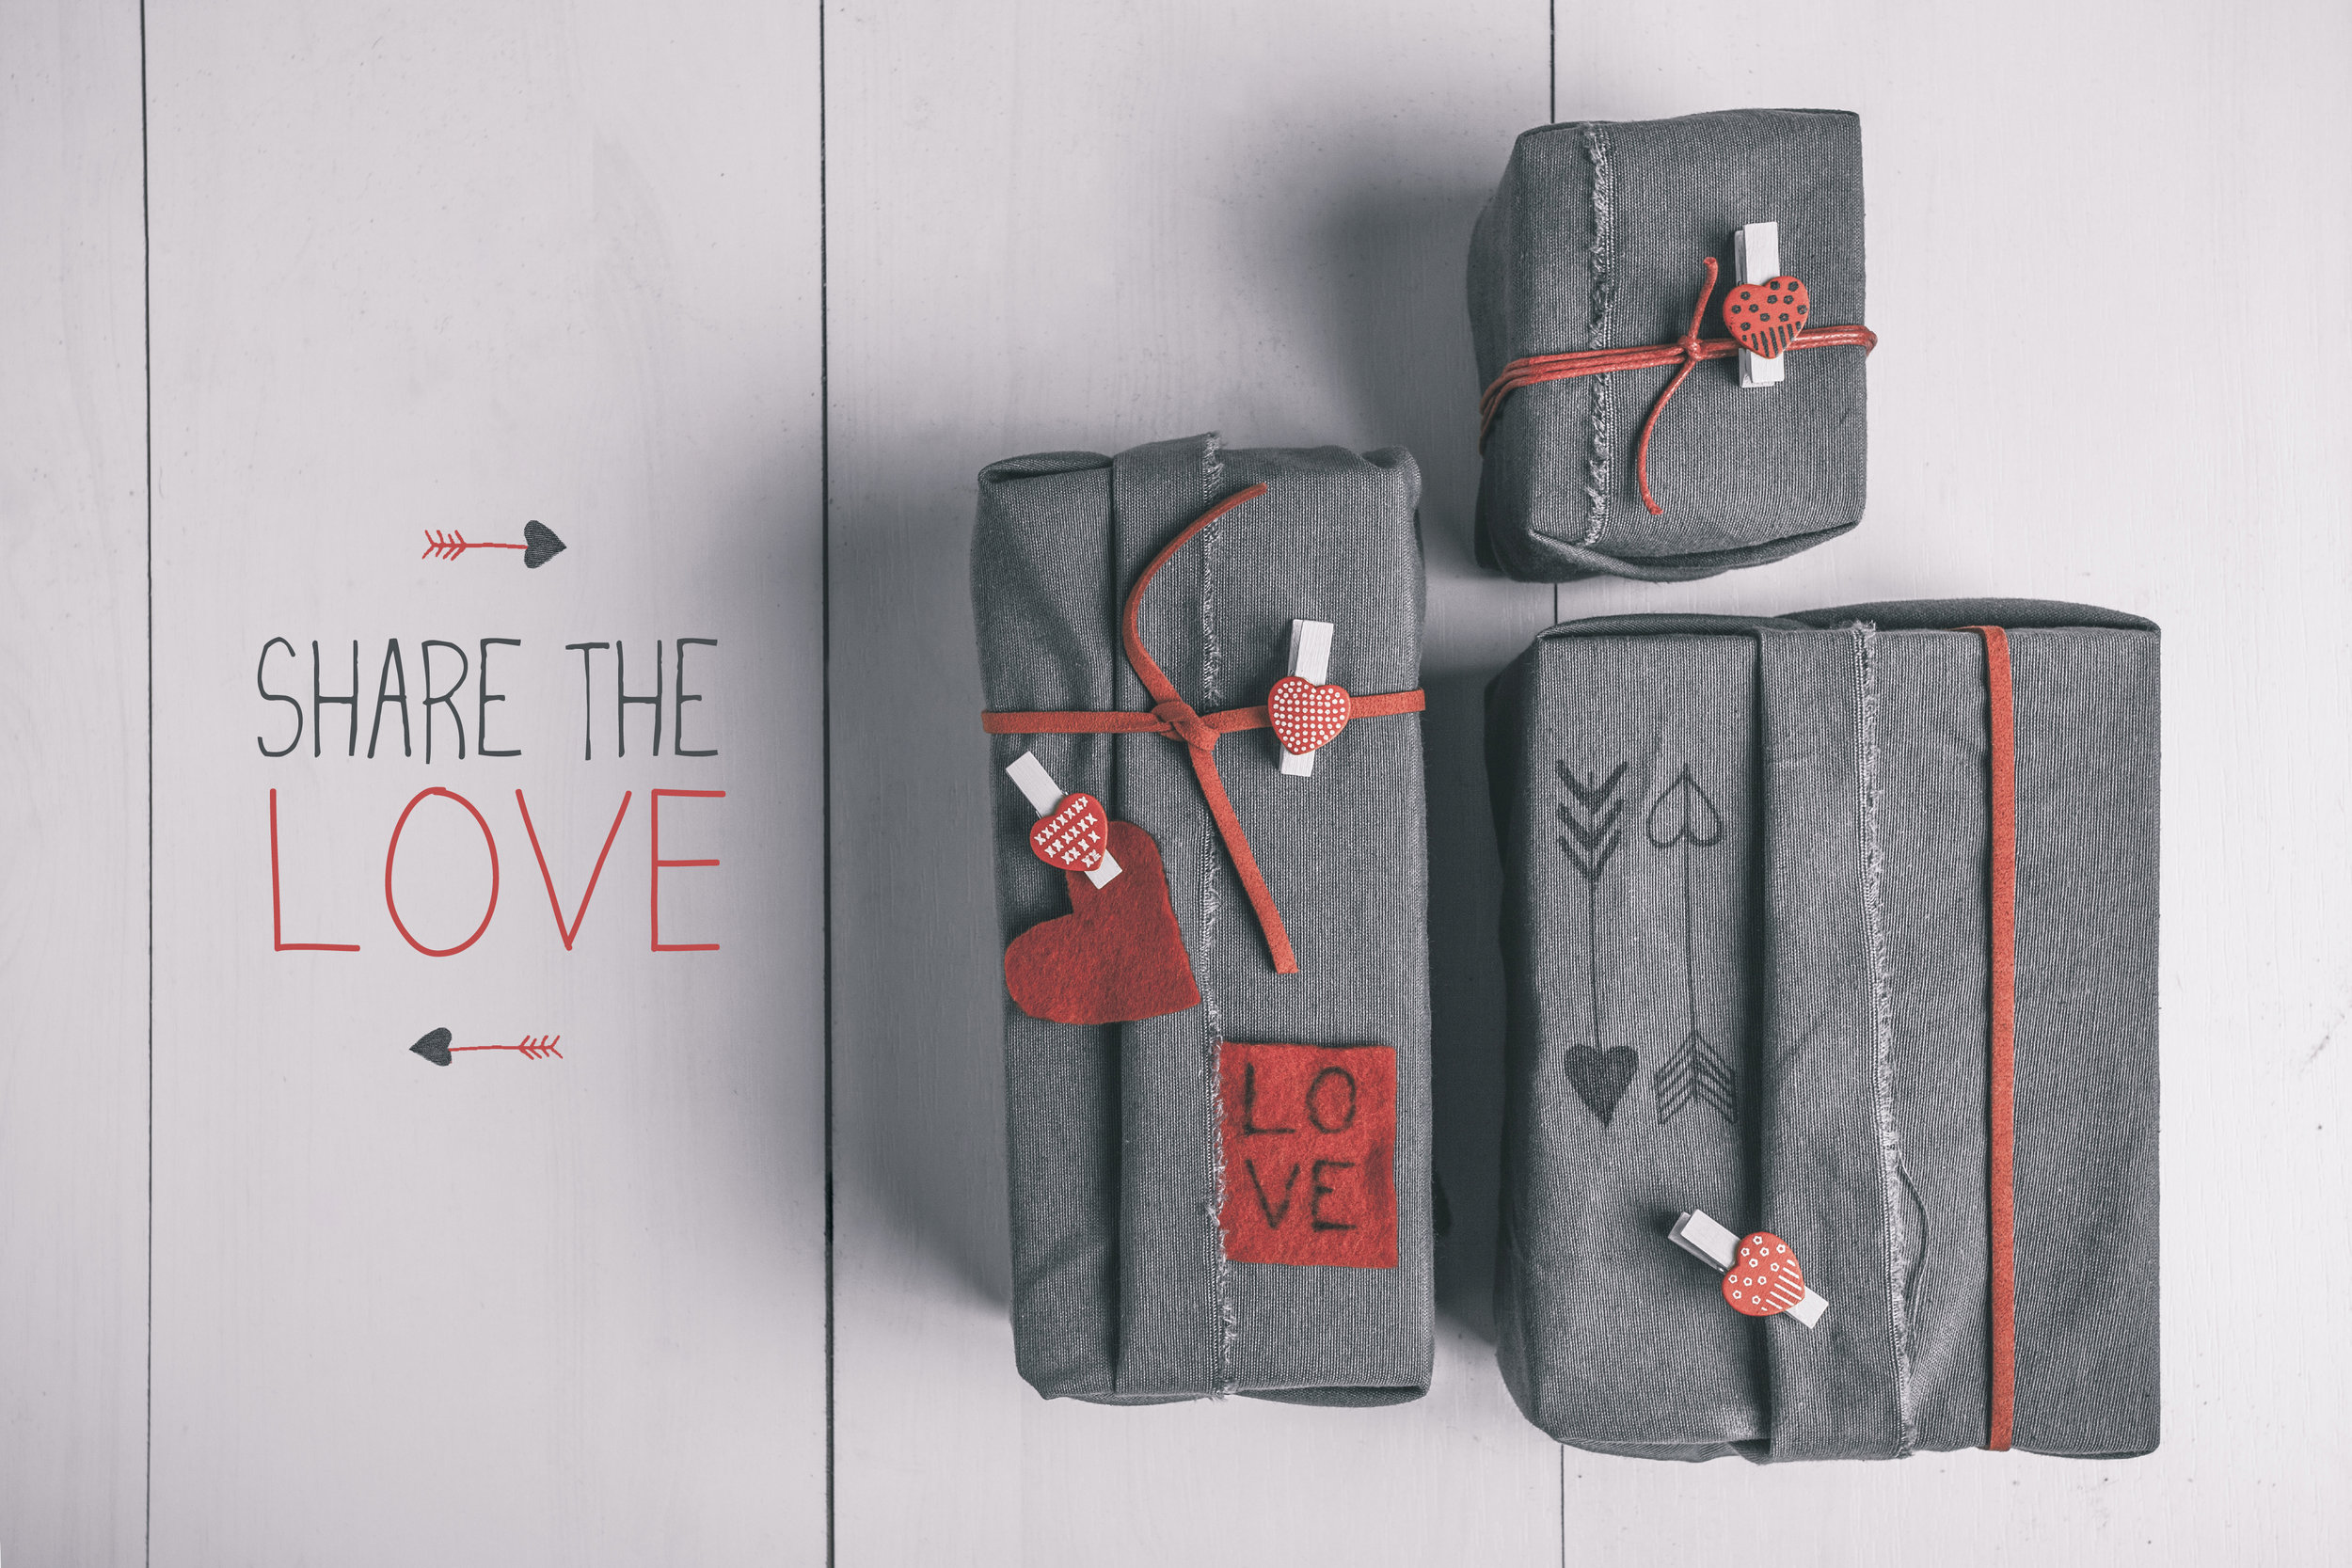 22642_Share_the_Love.jpg